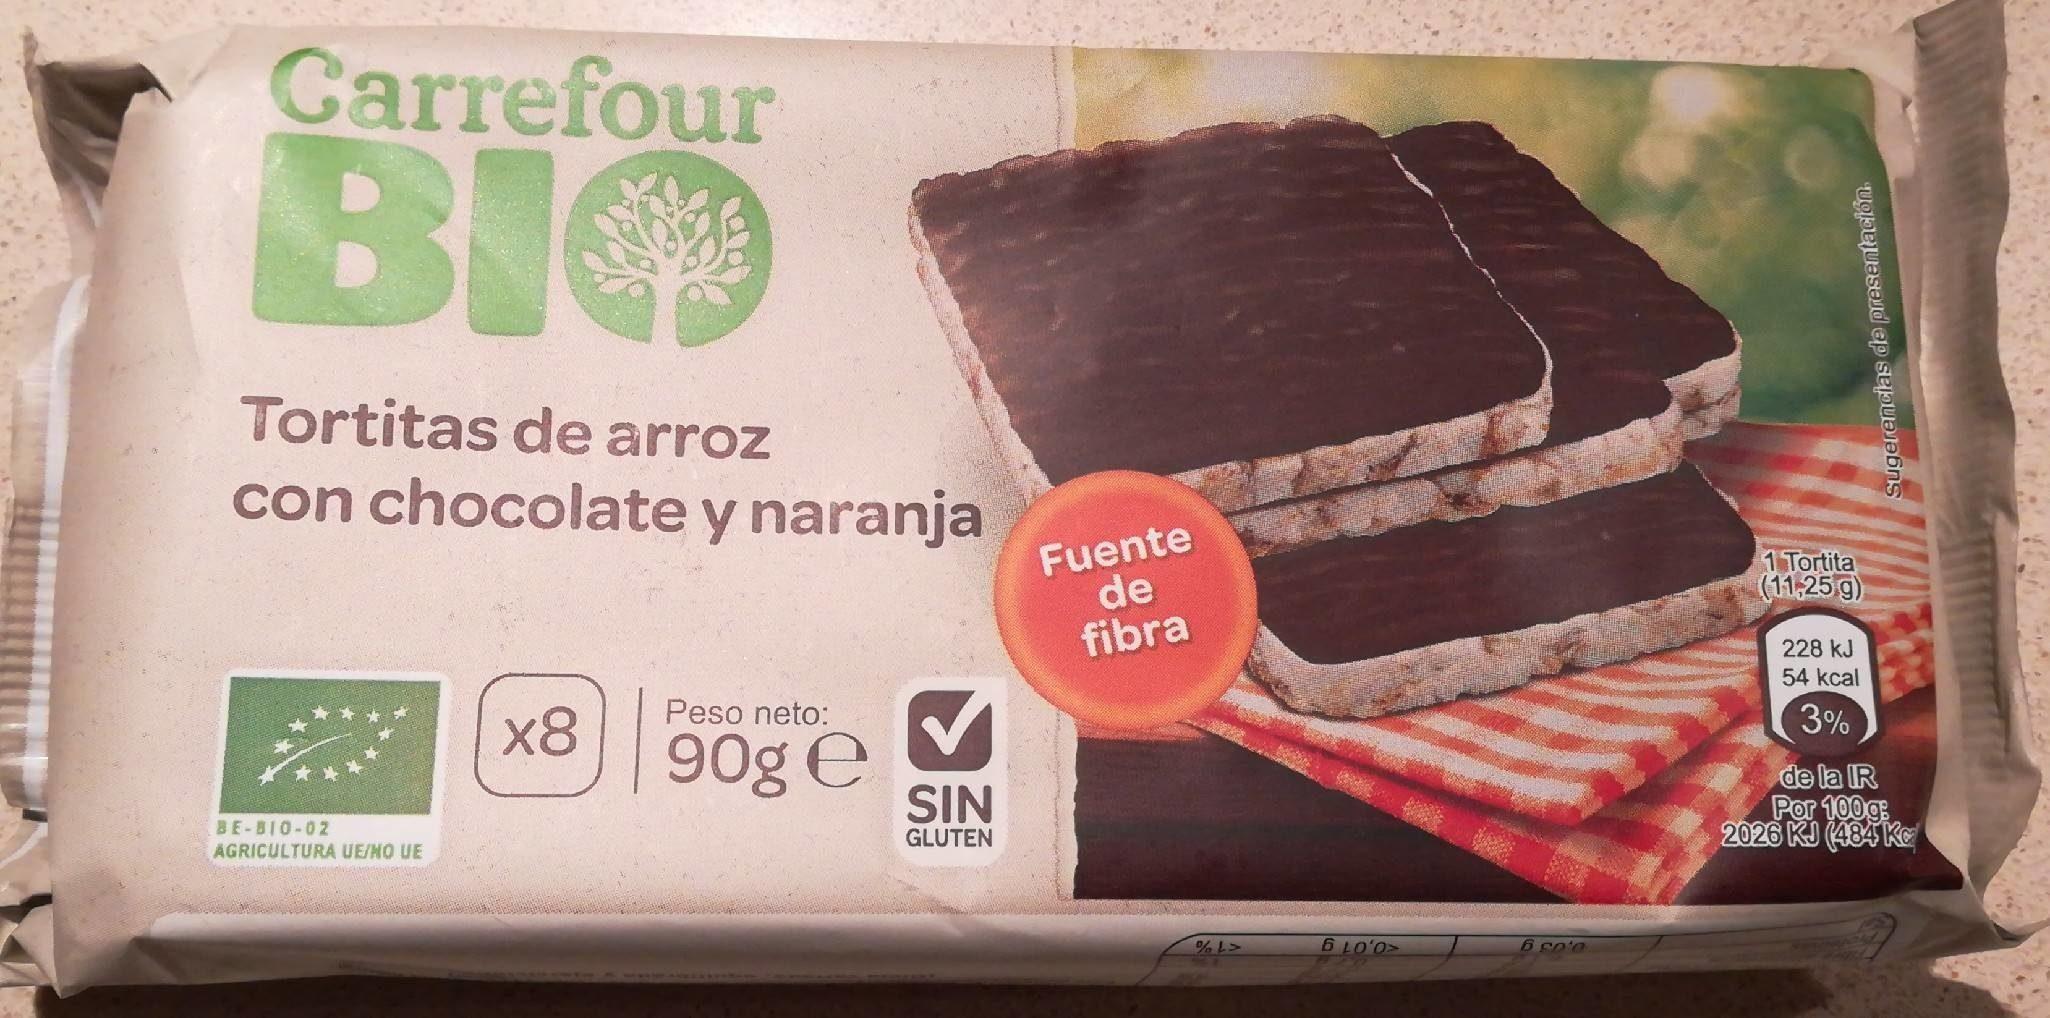 Tortitas arroz chocolate negro naranja - Produit - fr